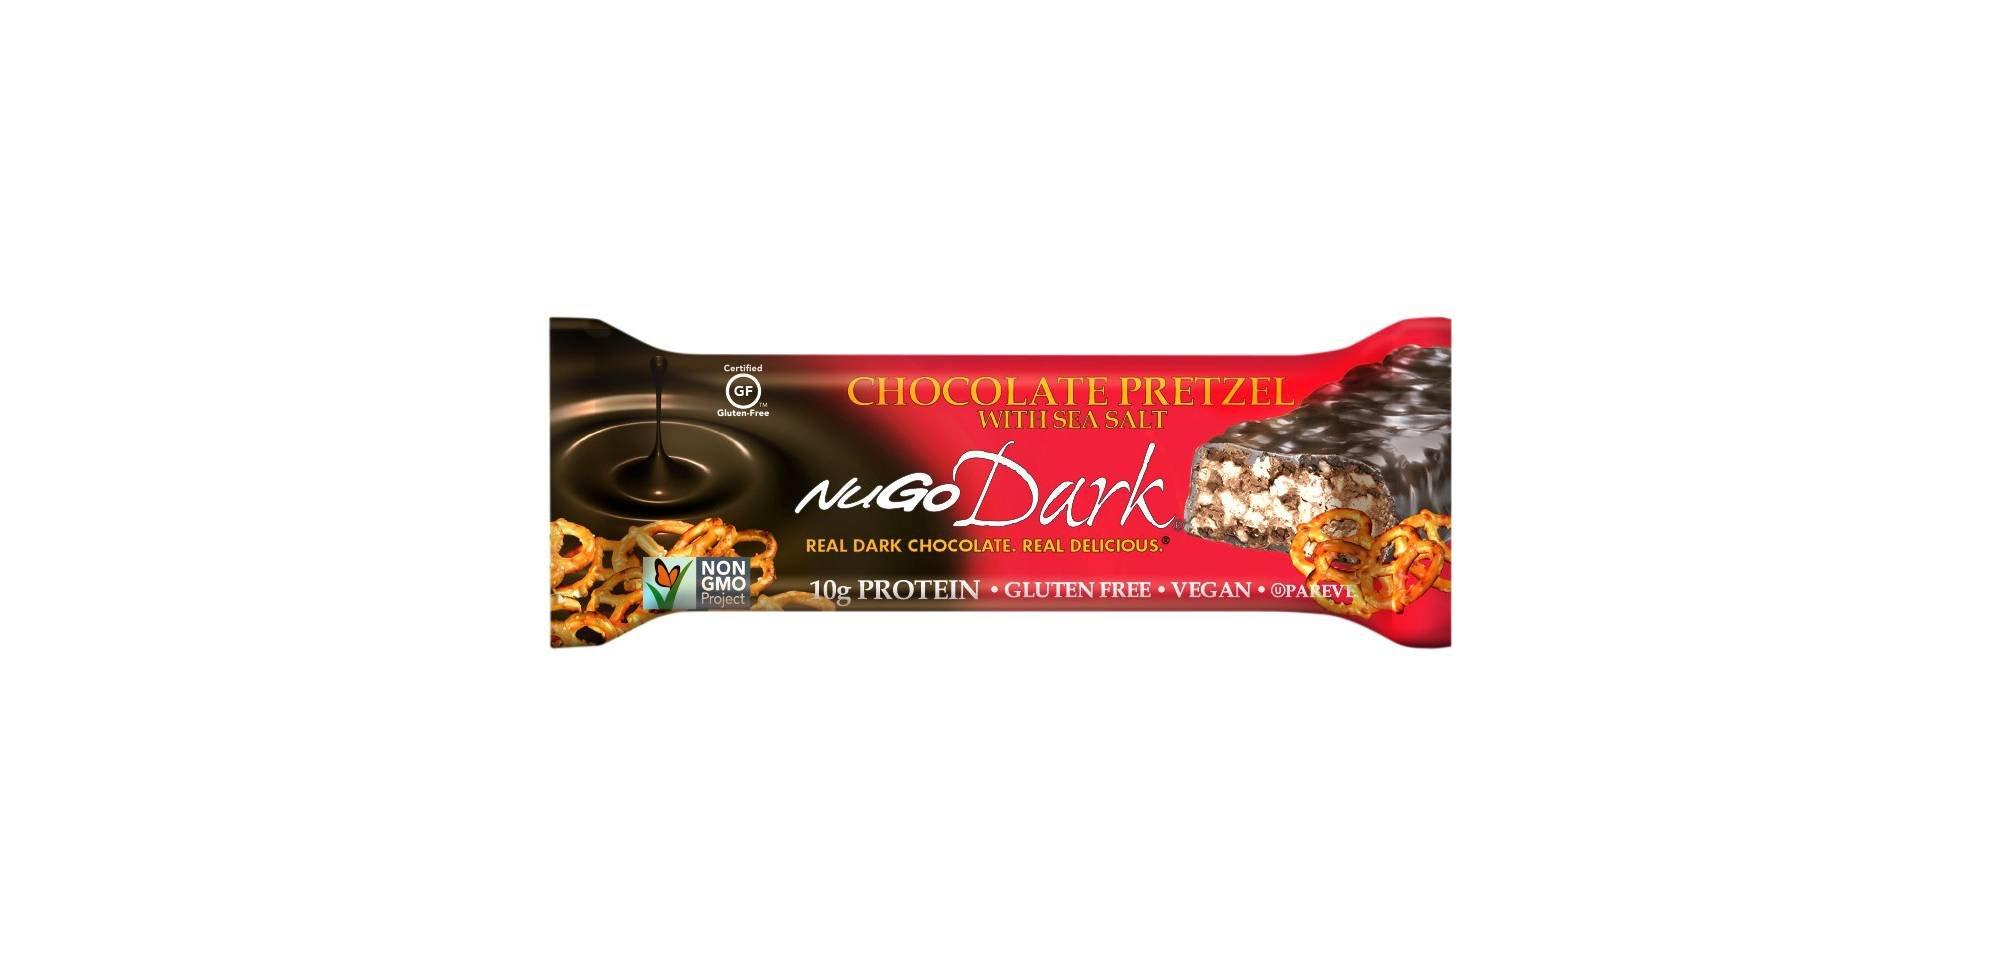 Nugo Dark Chocolate Pretzel with Sea Salt Gluten Free Granola Bars 1.76ozx5 bars, total 8.8oz